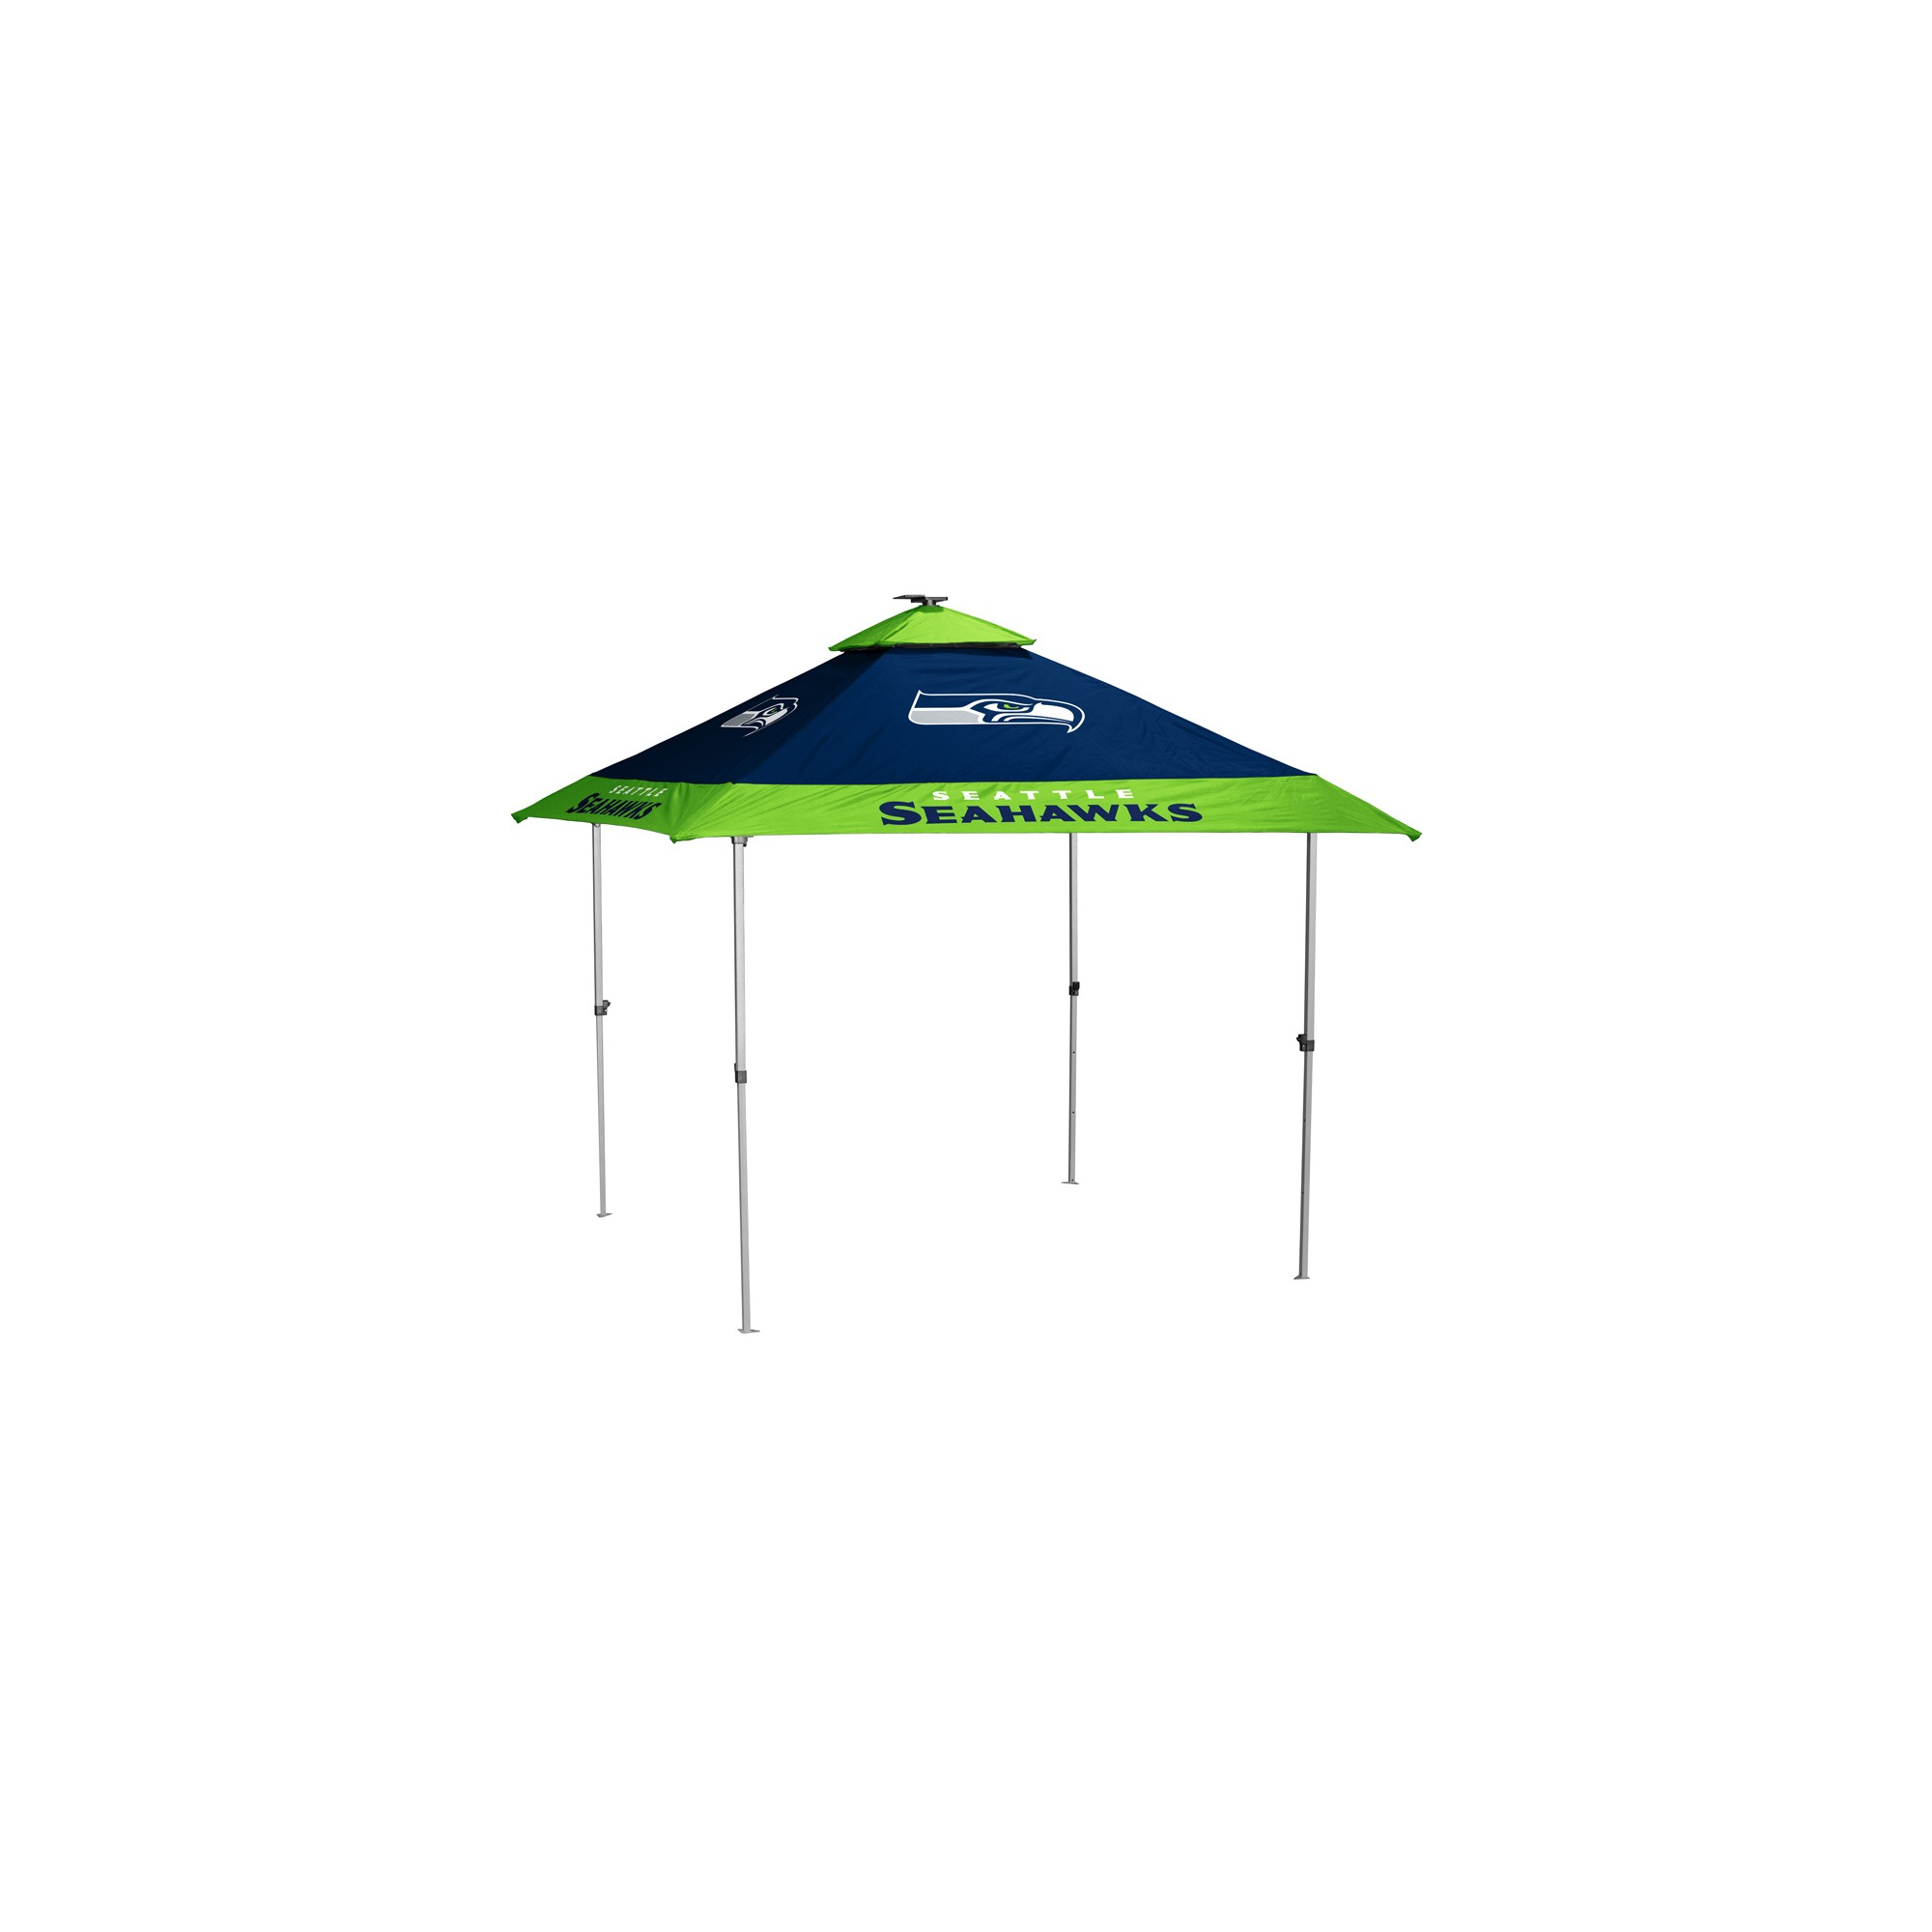 NFL Seattle Seahawks 10x10u0027 Pagoda Canopy Tent  sc 1 st  Pinterest & NFL Seattle Seahawks 10x10u0027 Pagoda Canopy Tent | Canopy tent Nfl ...